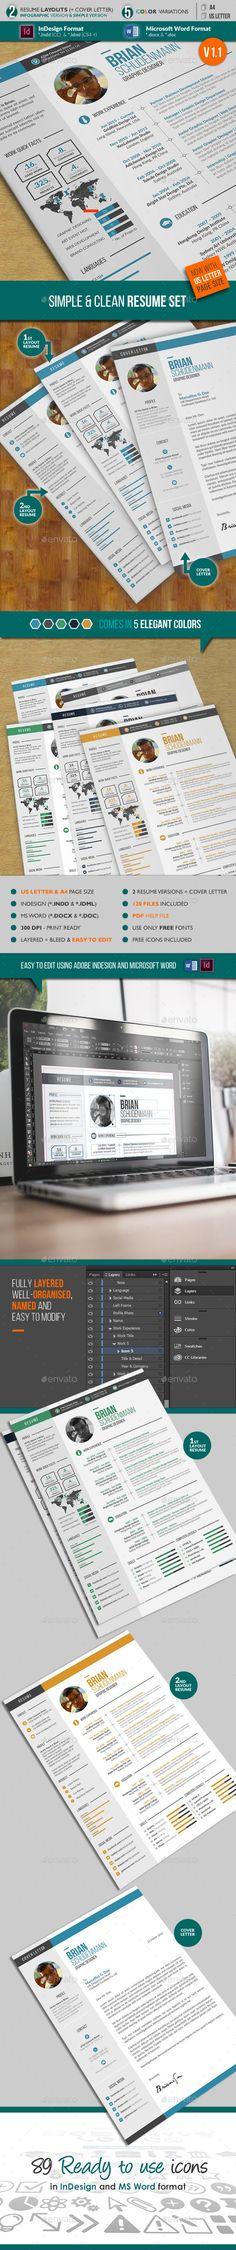 Modern Resume 3 Set Modern resume - resume word template download